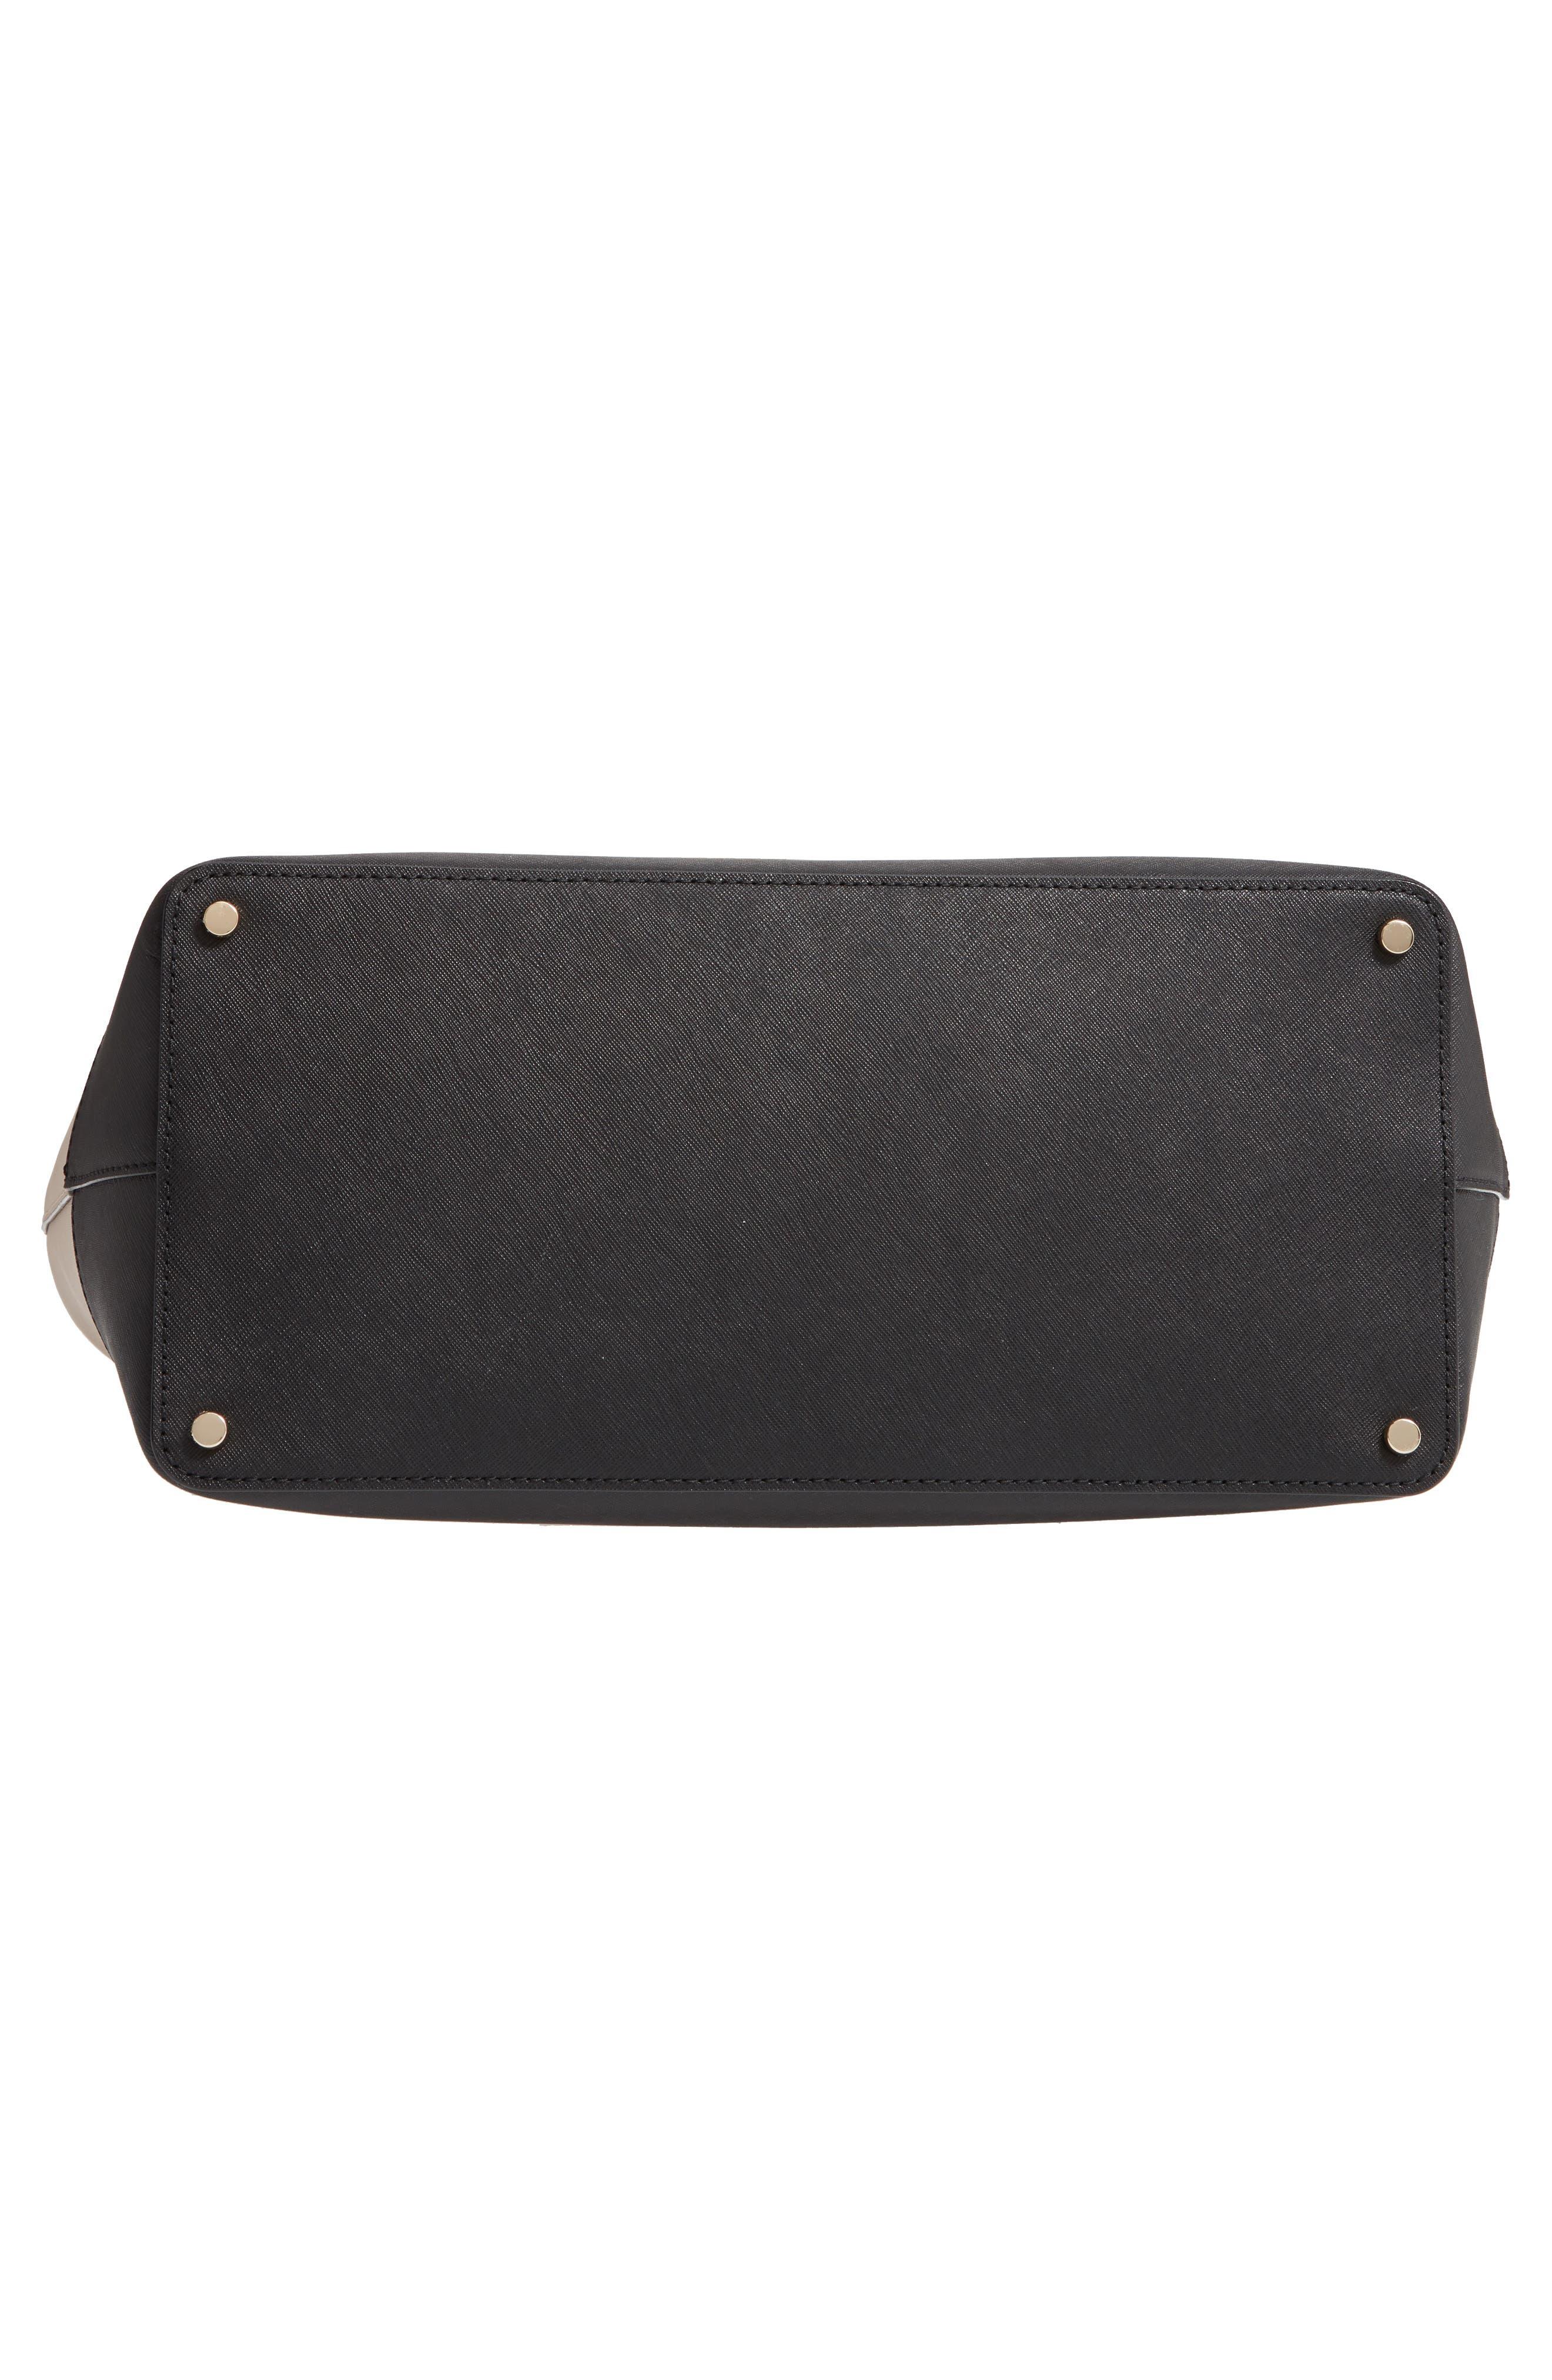 medium cameron street - harmony saffiano leather tote,                             Alternate thumbnail 6, color,                             TUSK/ BLACK